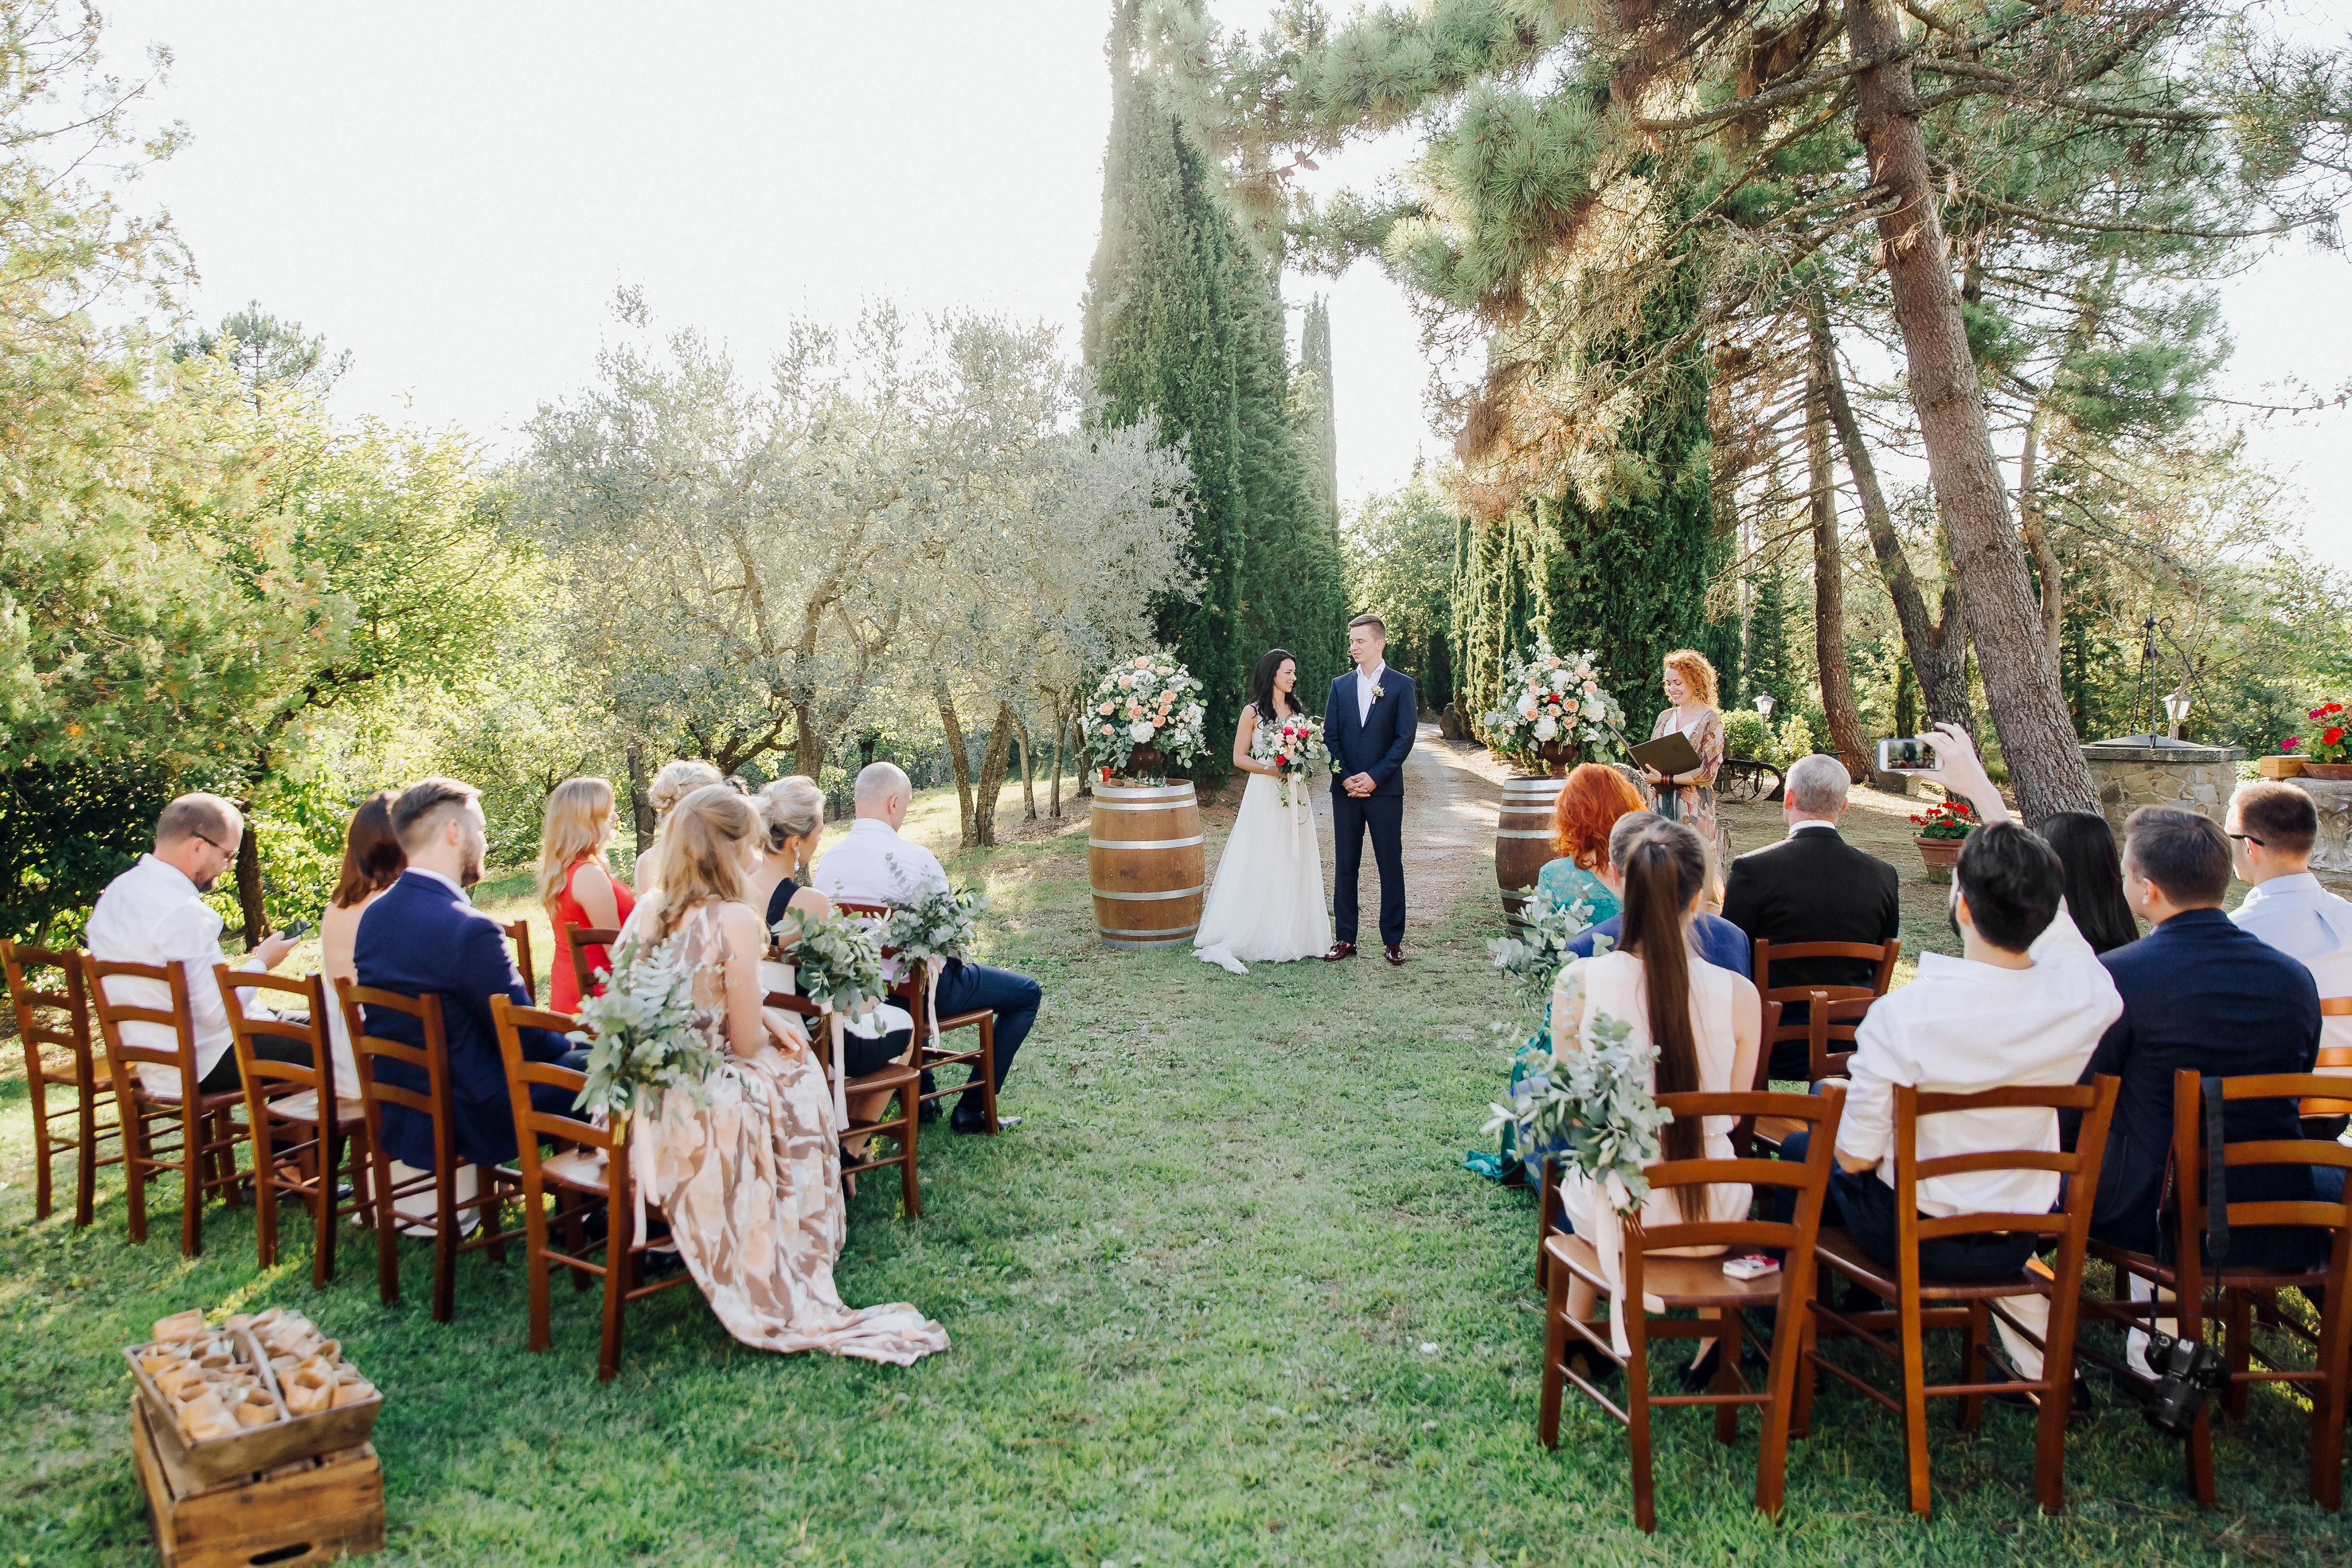 Matrimonio Villa Olimpia - villa Olimpia wedding